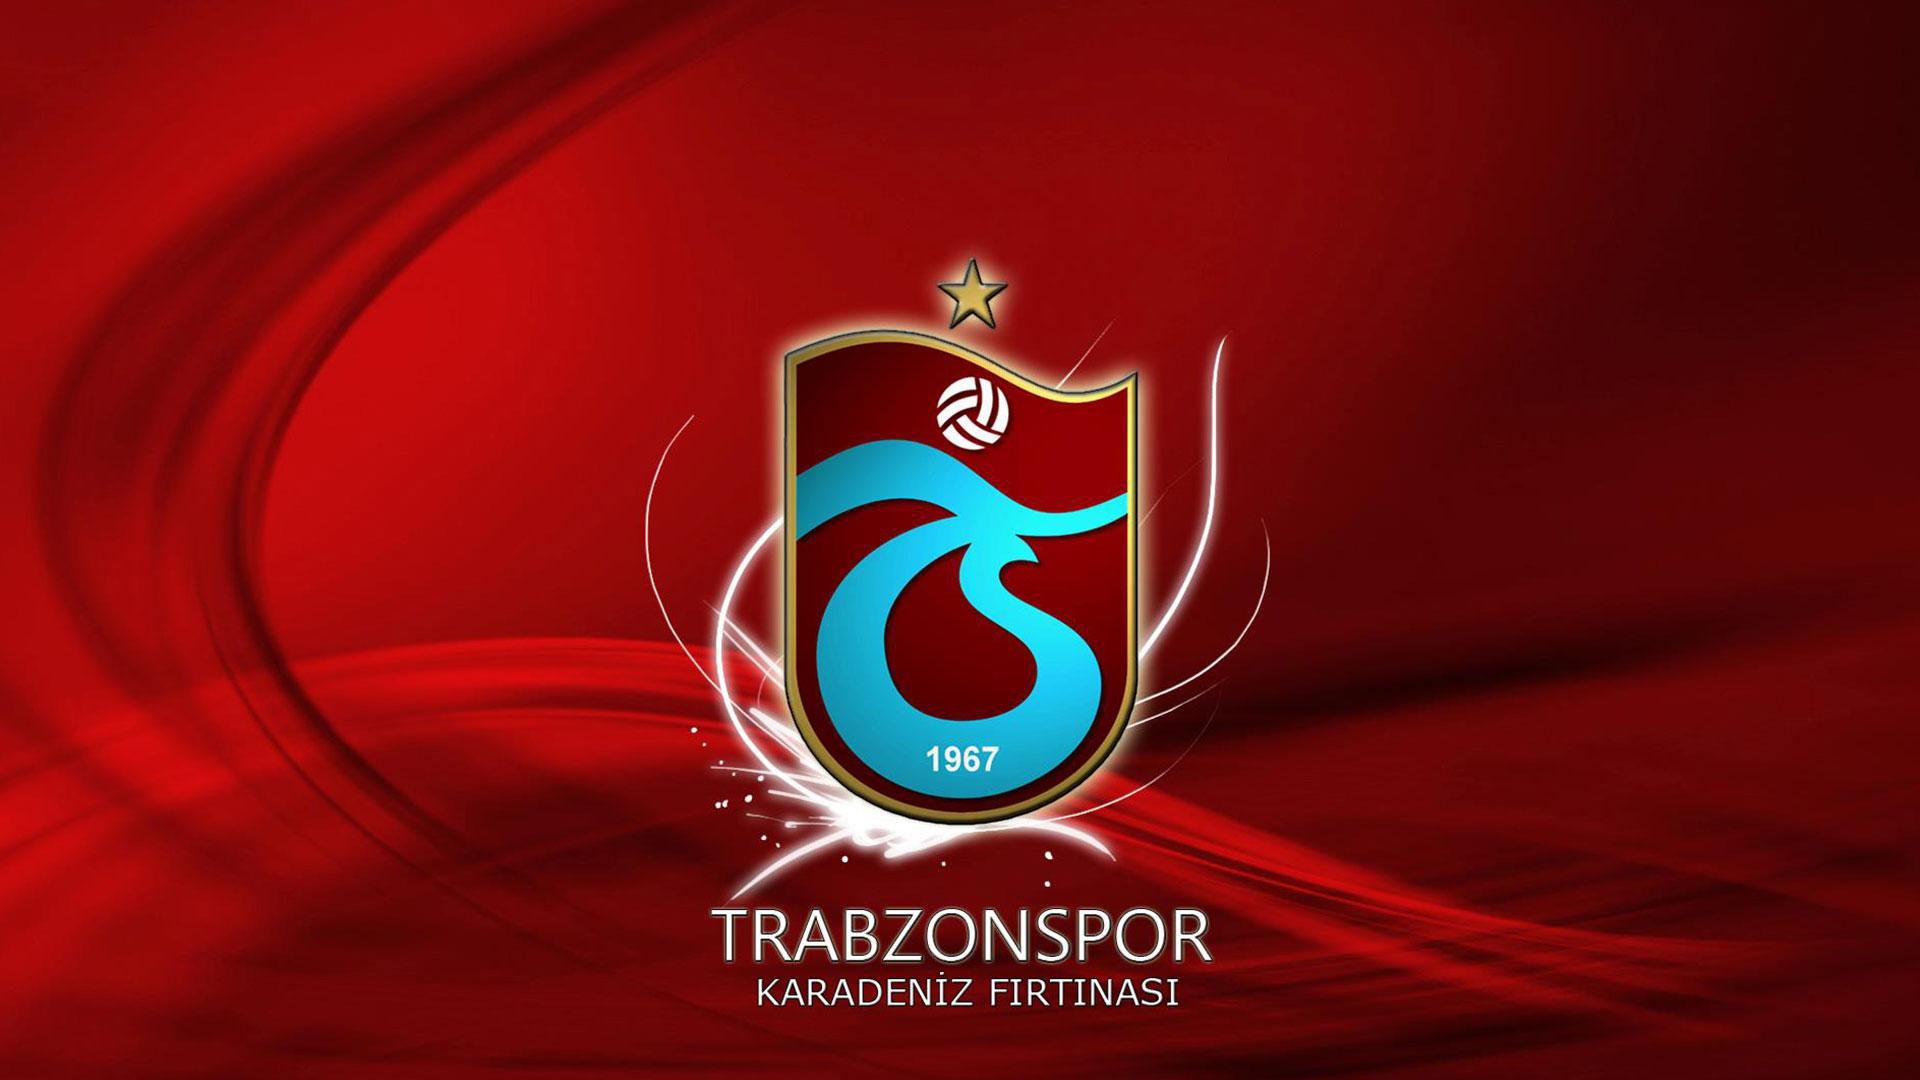 Mobil Hd Wallpaper En G 252 Zel Trabzonspor Resimleri Rooteto